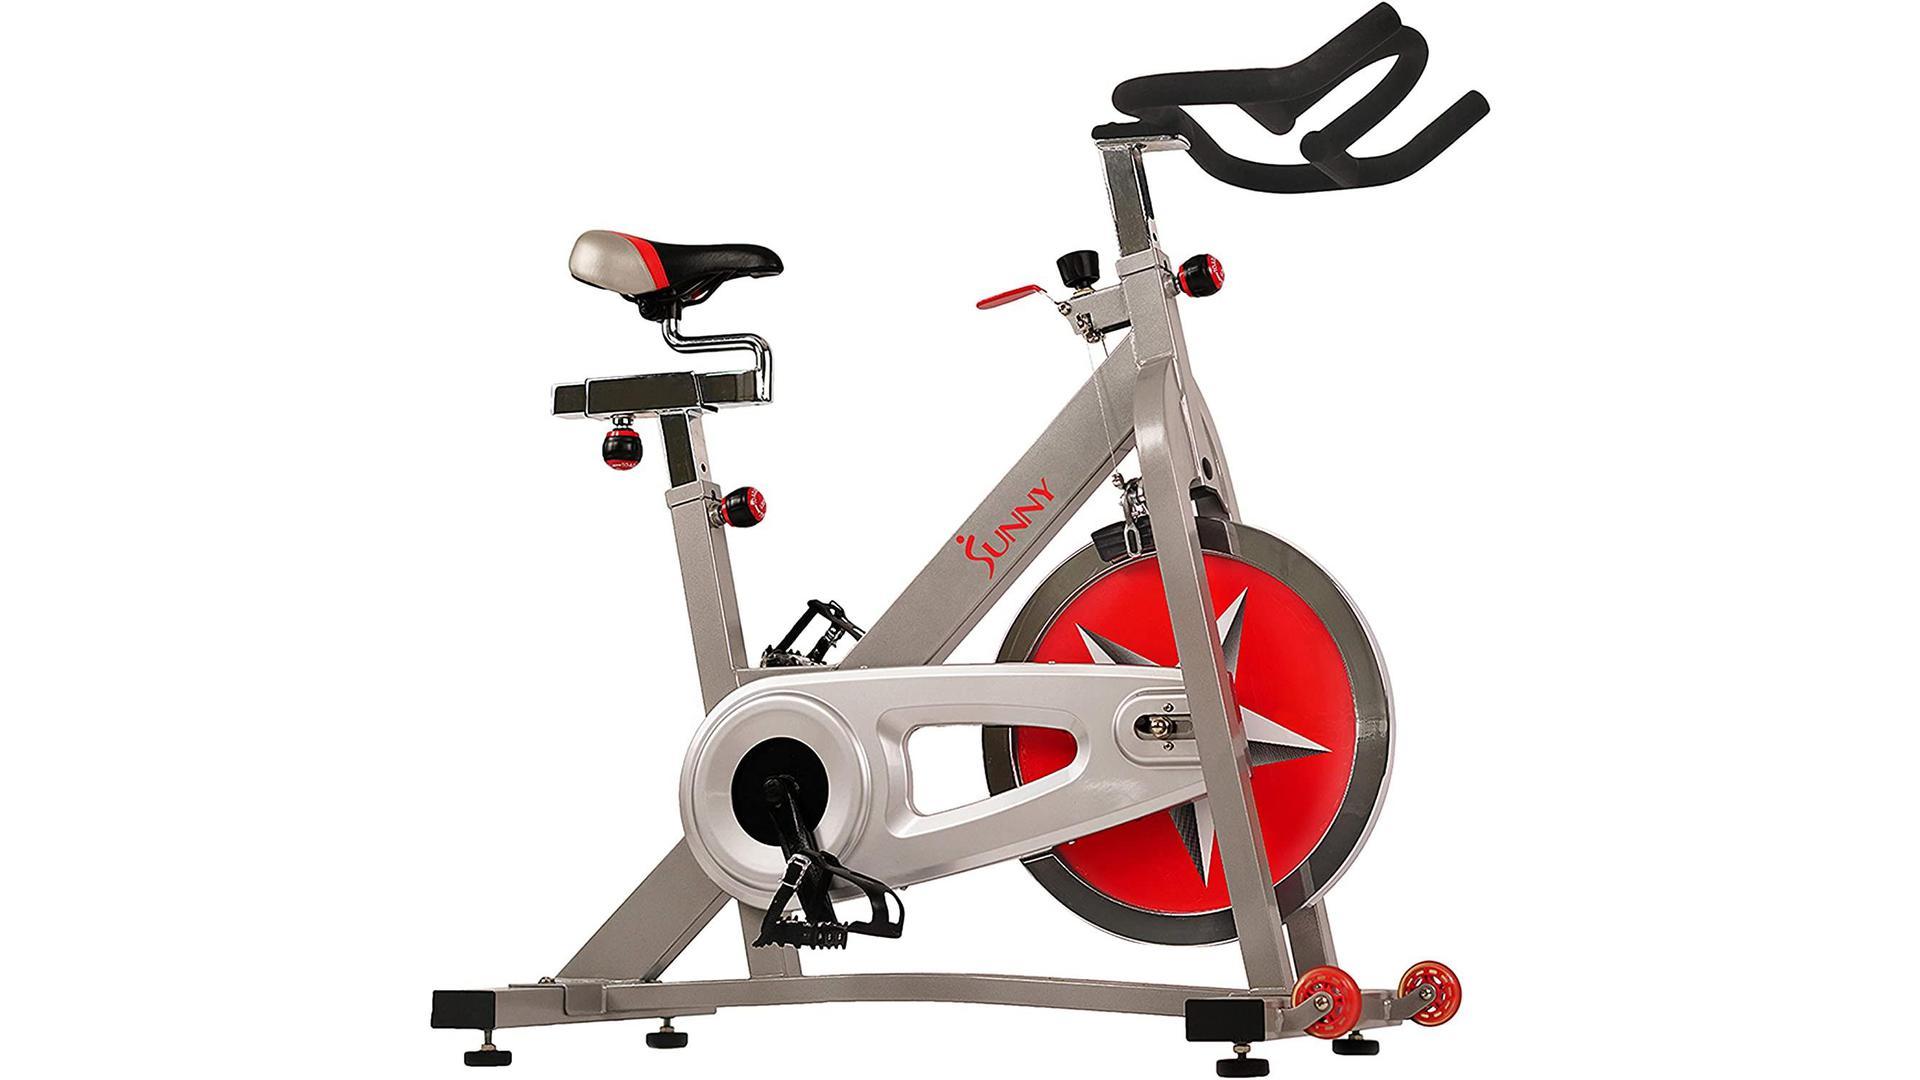 Best Home Gym Equipment Spin Bike 16x9